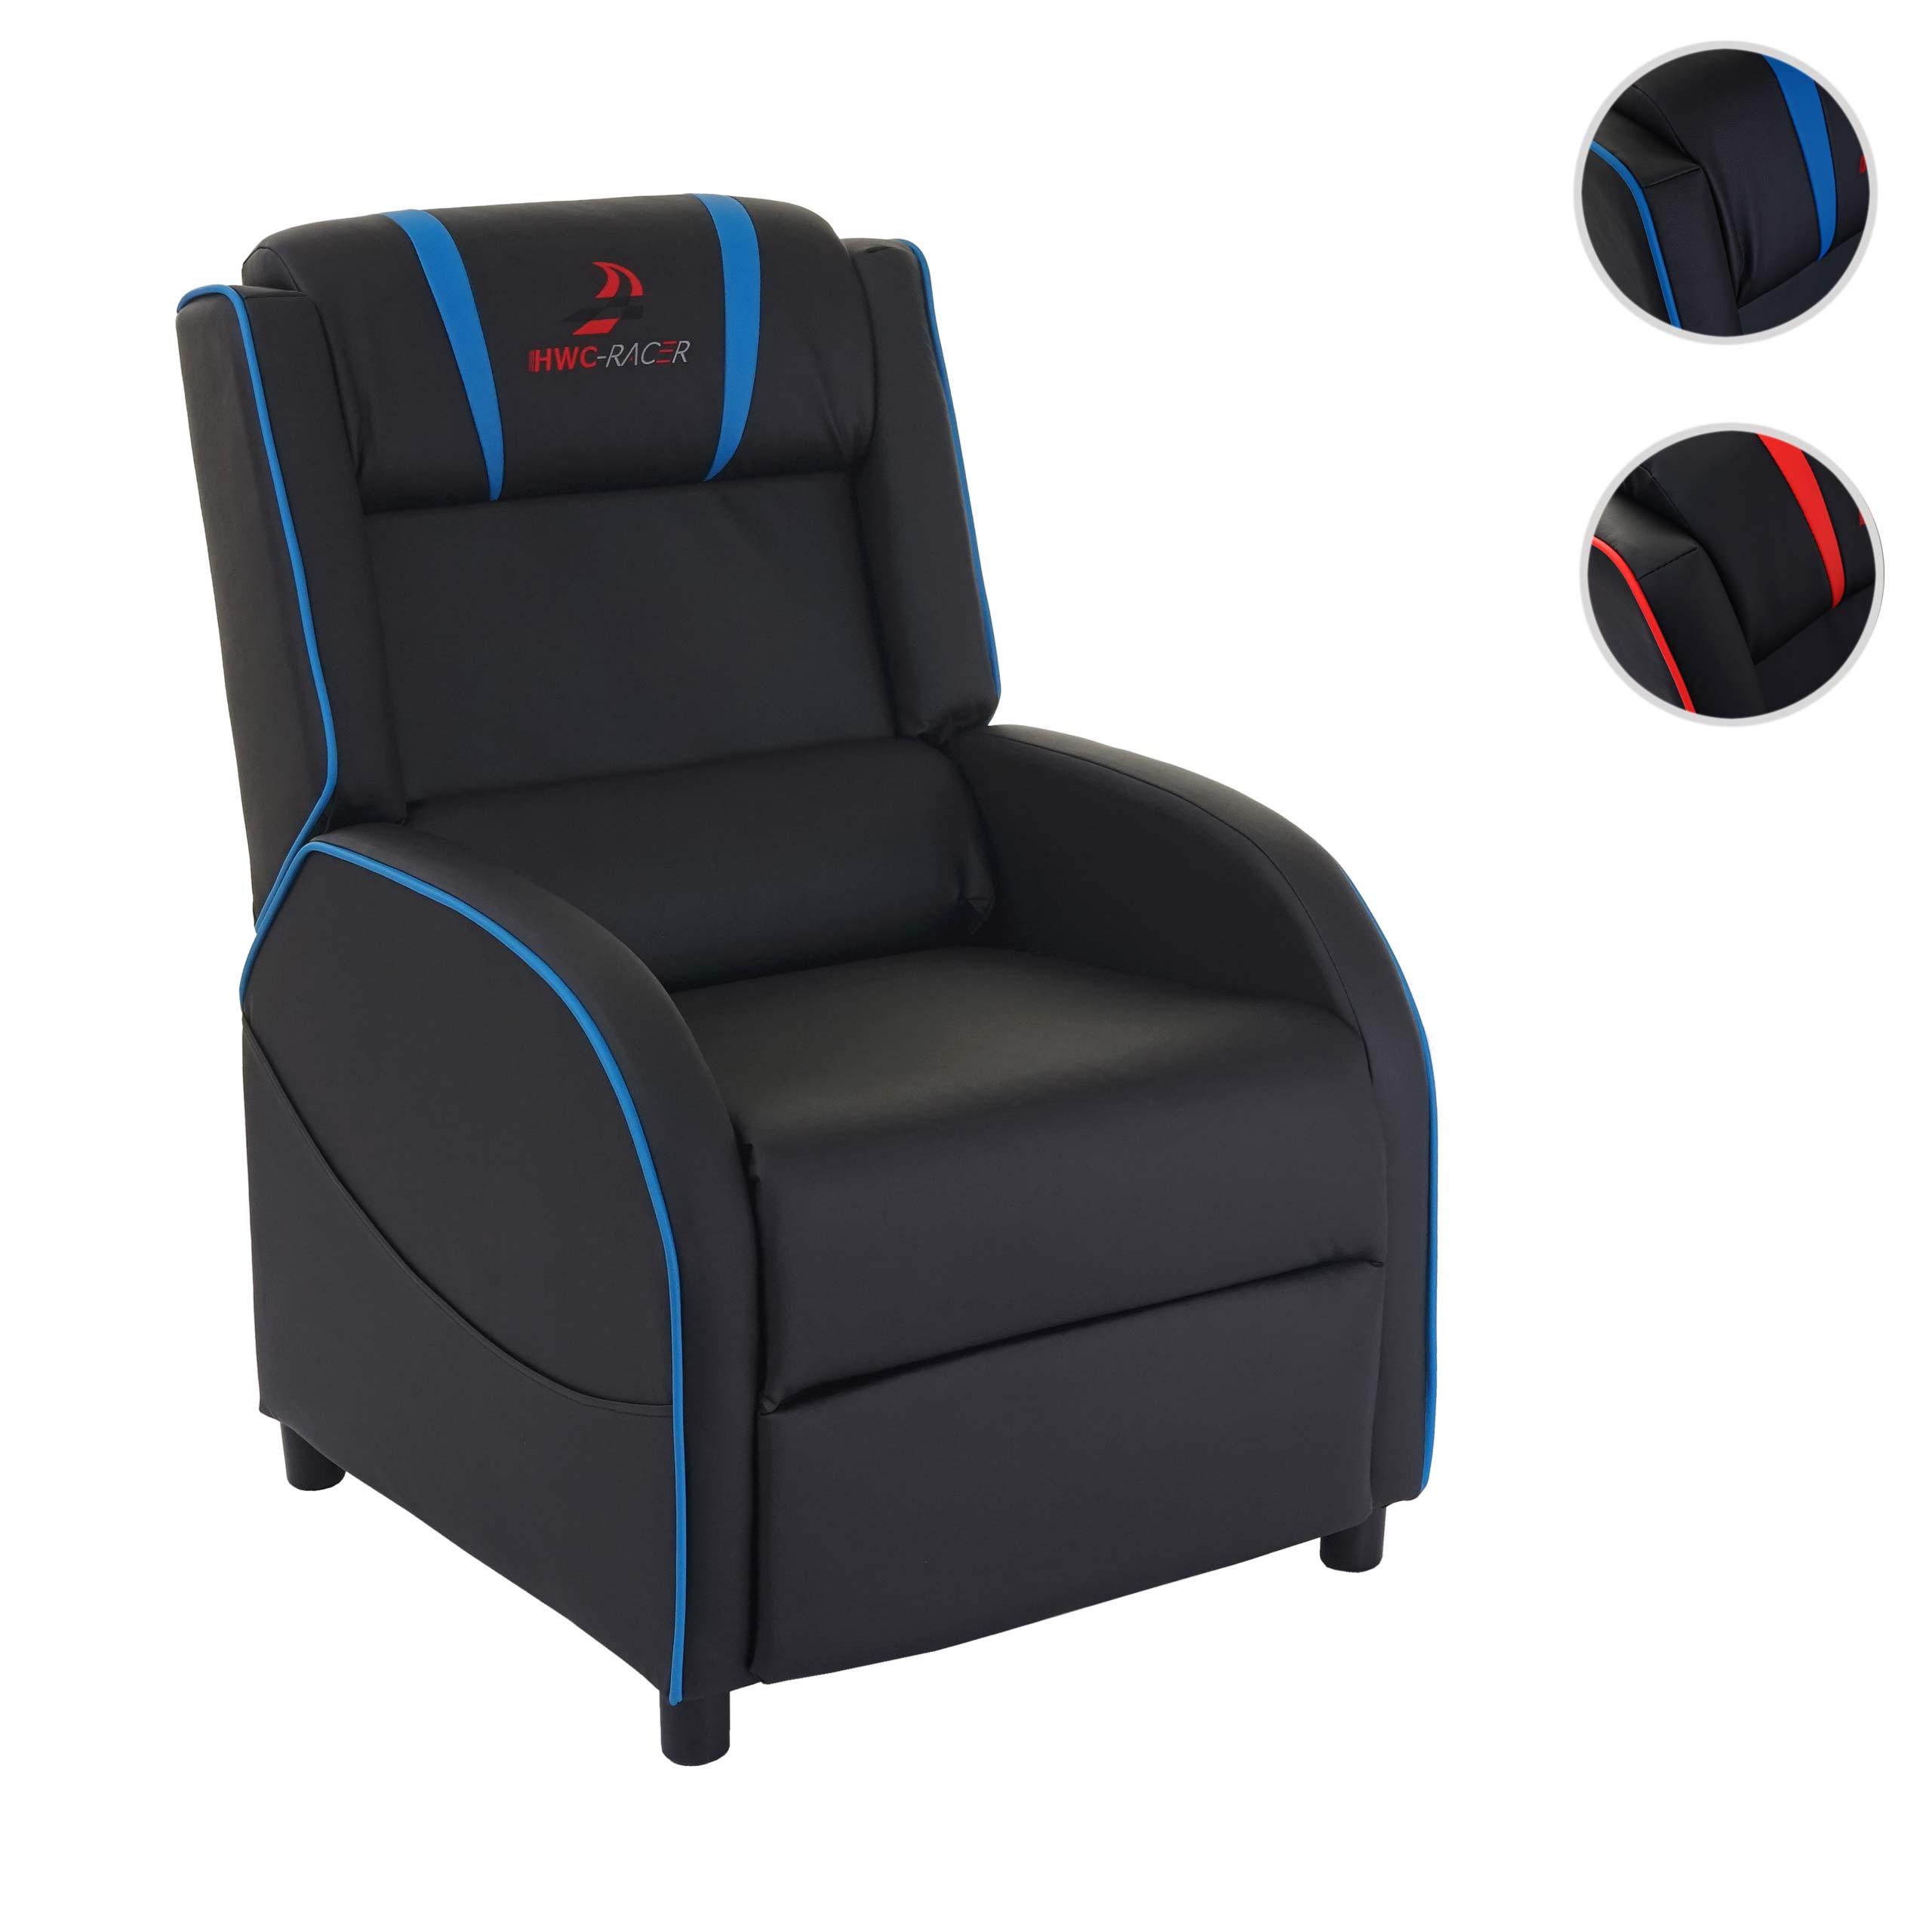 Mendler Fernsehsessel HWC-D68, HWC-Racer Relaxsessel TV-Sessel Gaming-Sessel, Kunstleder ~ Variantenangebot 64110